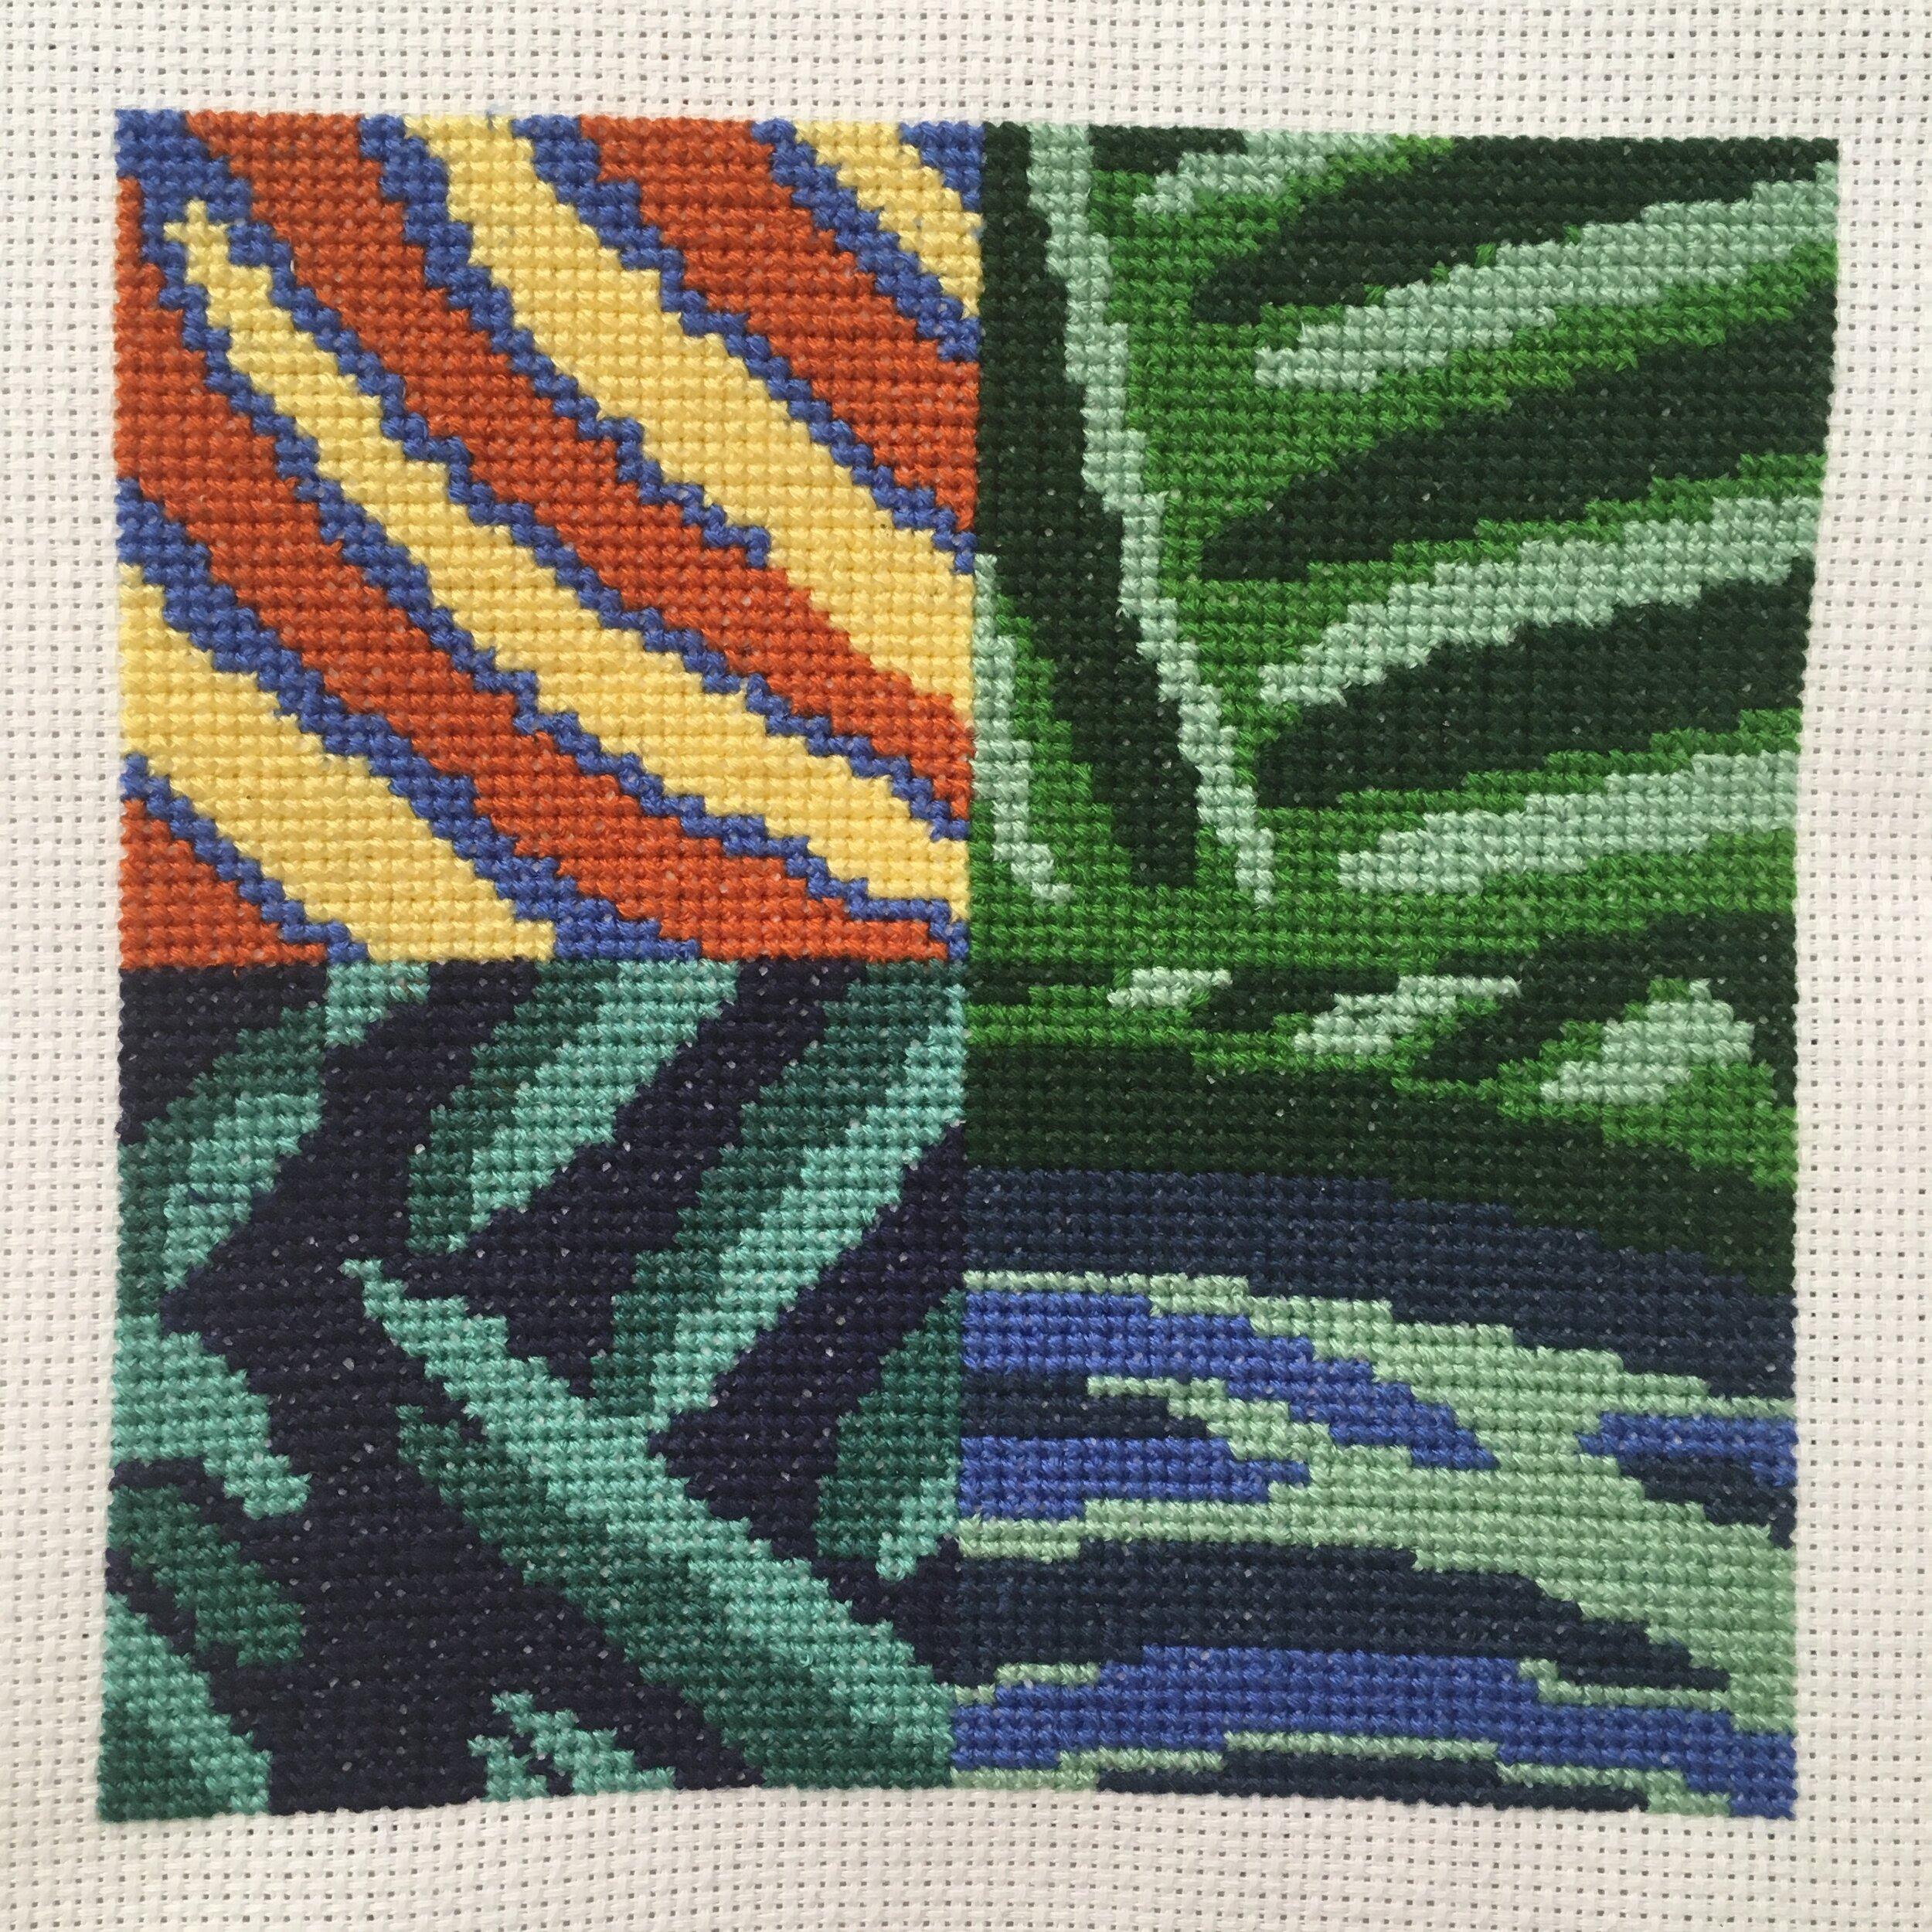 Translation #3 - Cross-Stitch , 2019, embroidery floss, Aida cloth, 6 x 6 inches